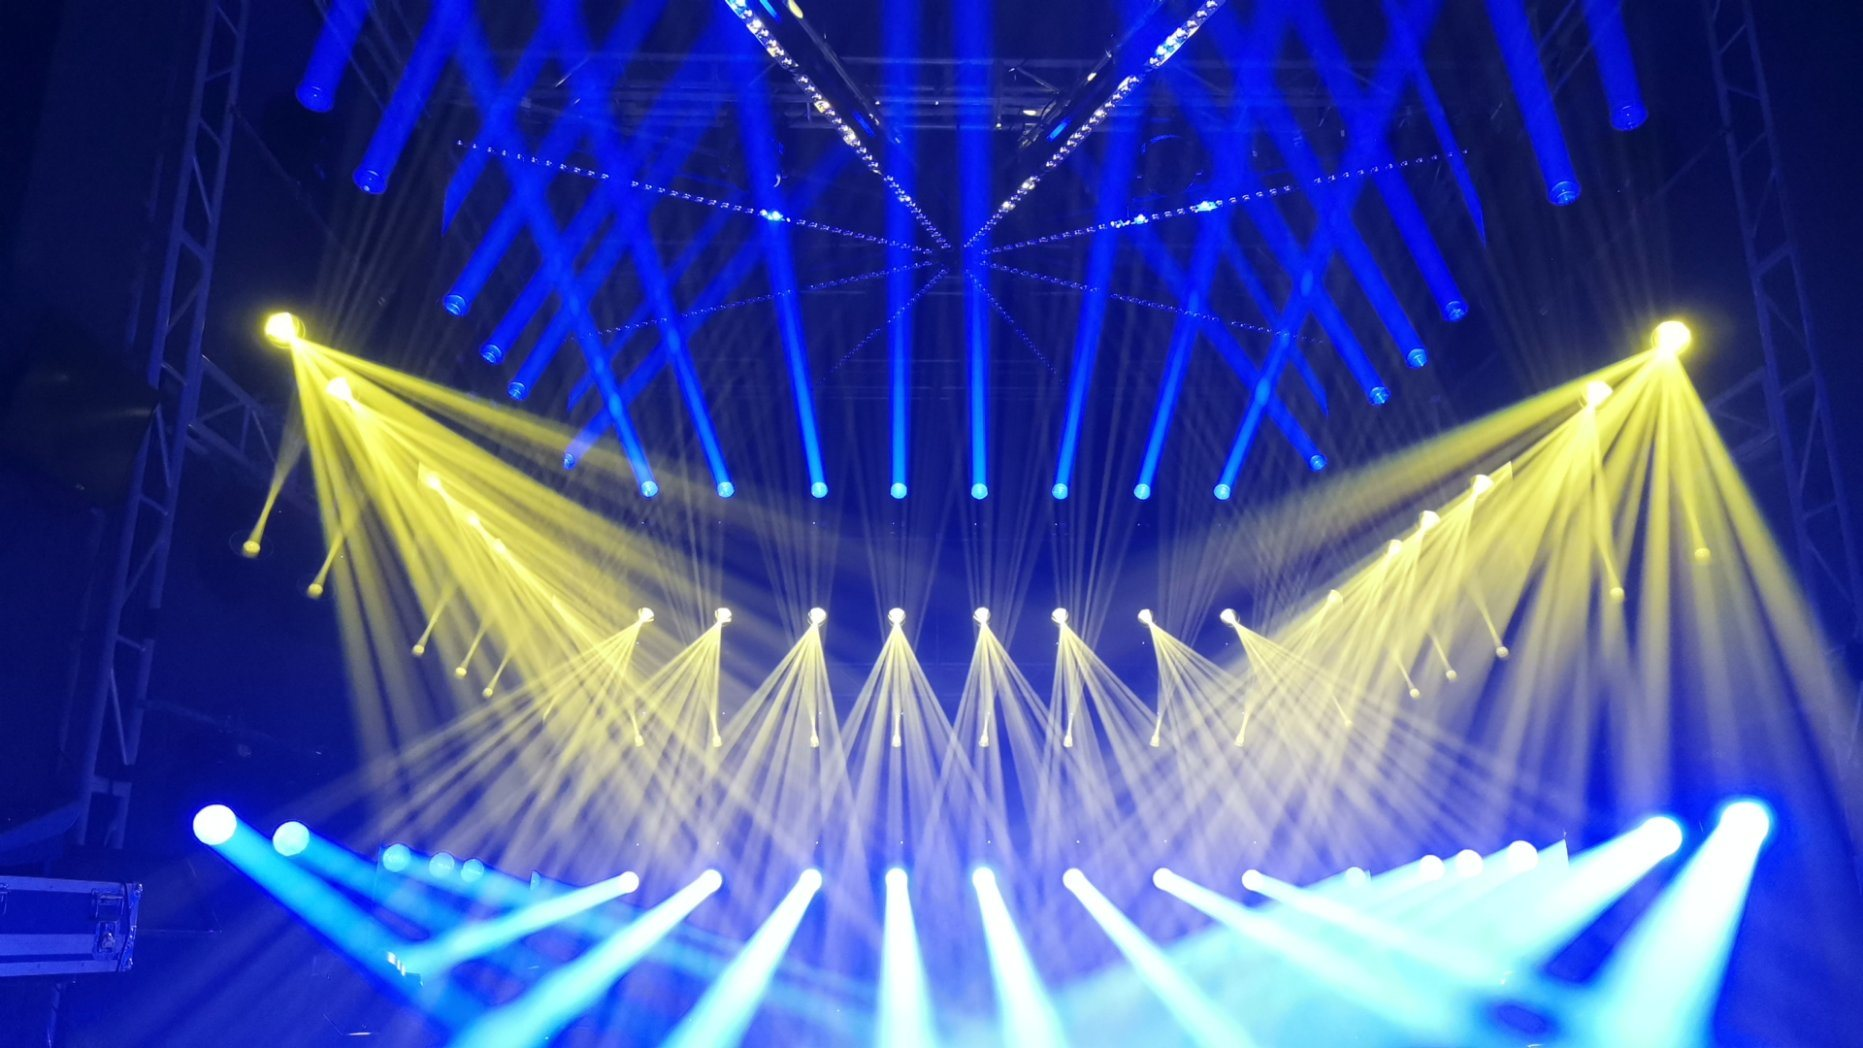 Sharpy LED 90W mit LED-Ringstrahl-Beleuchtung Für Bühnenbeleuchtung